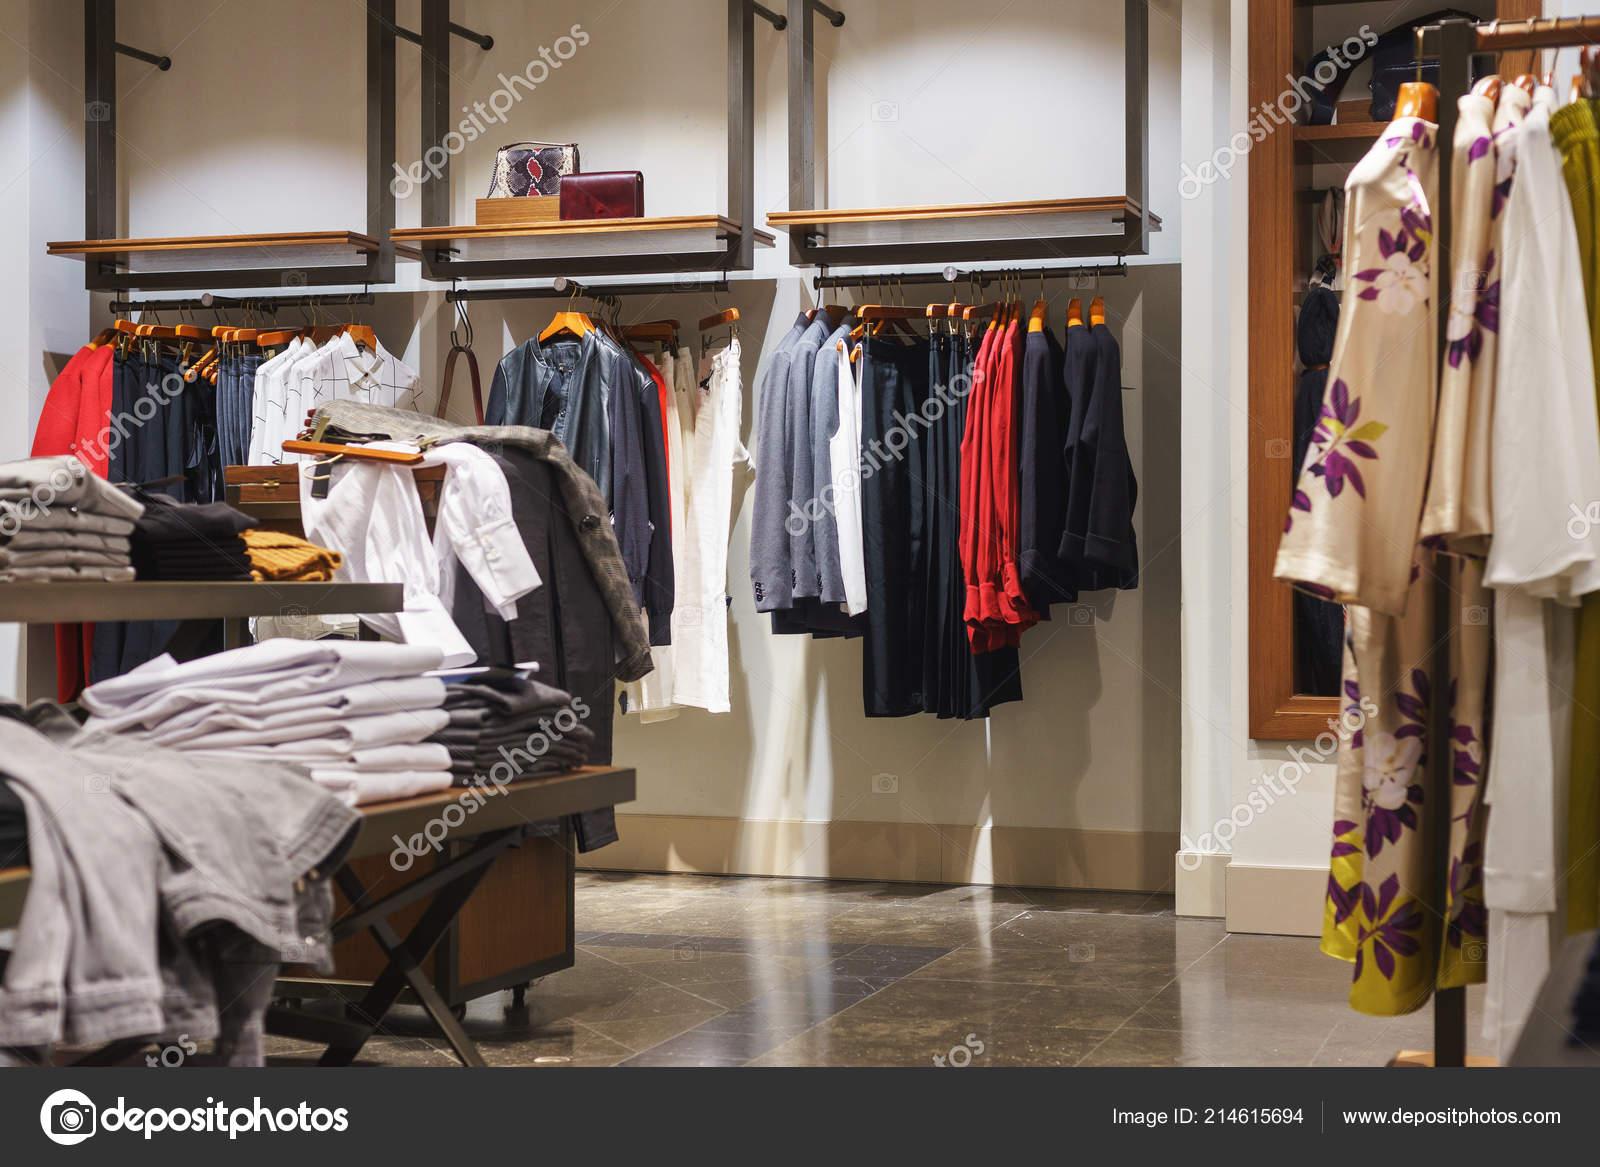 3b001e592be9 Γυναικεία και ανδρικά άλλα πανωφόρια στις κρεμάστρες και ράφια σε ένα  κατάστημα για μοντέρνα ρούχα– εικόνα αρχείου